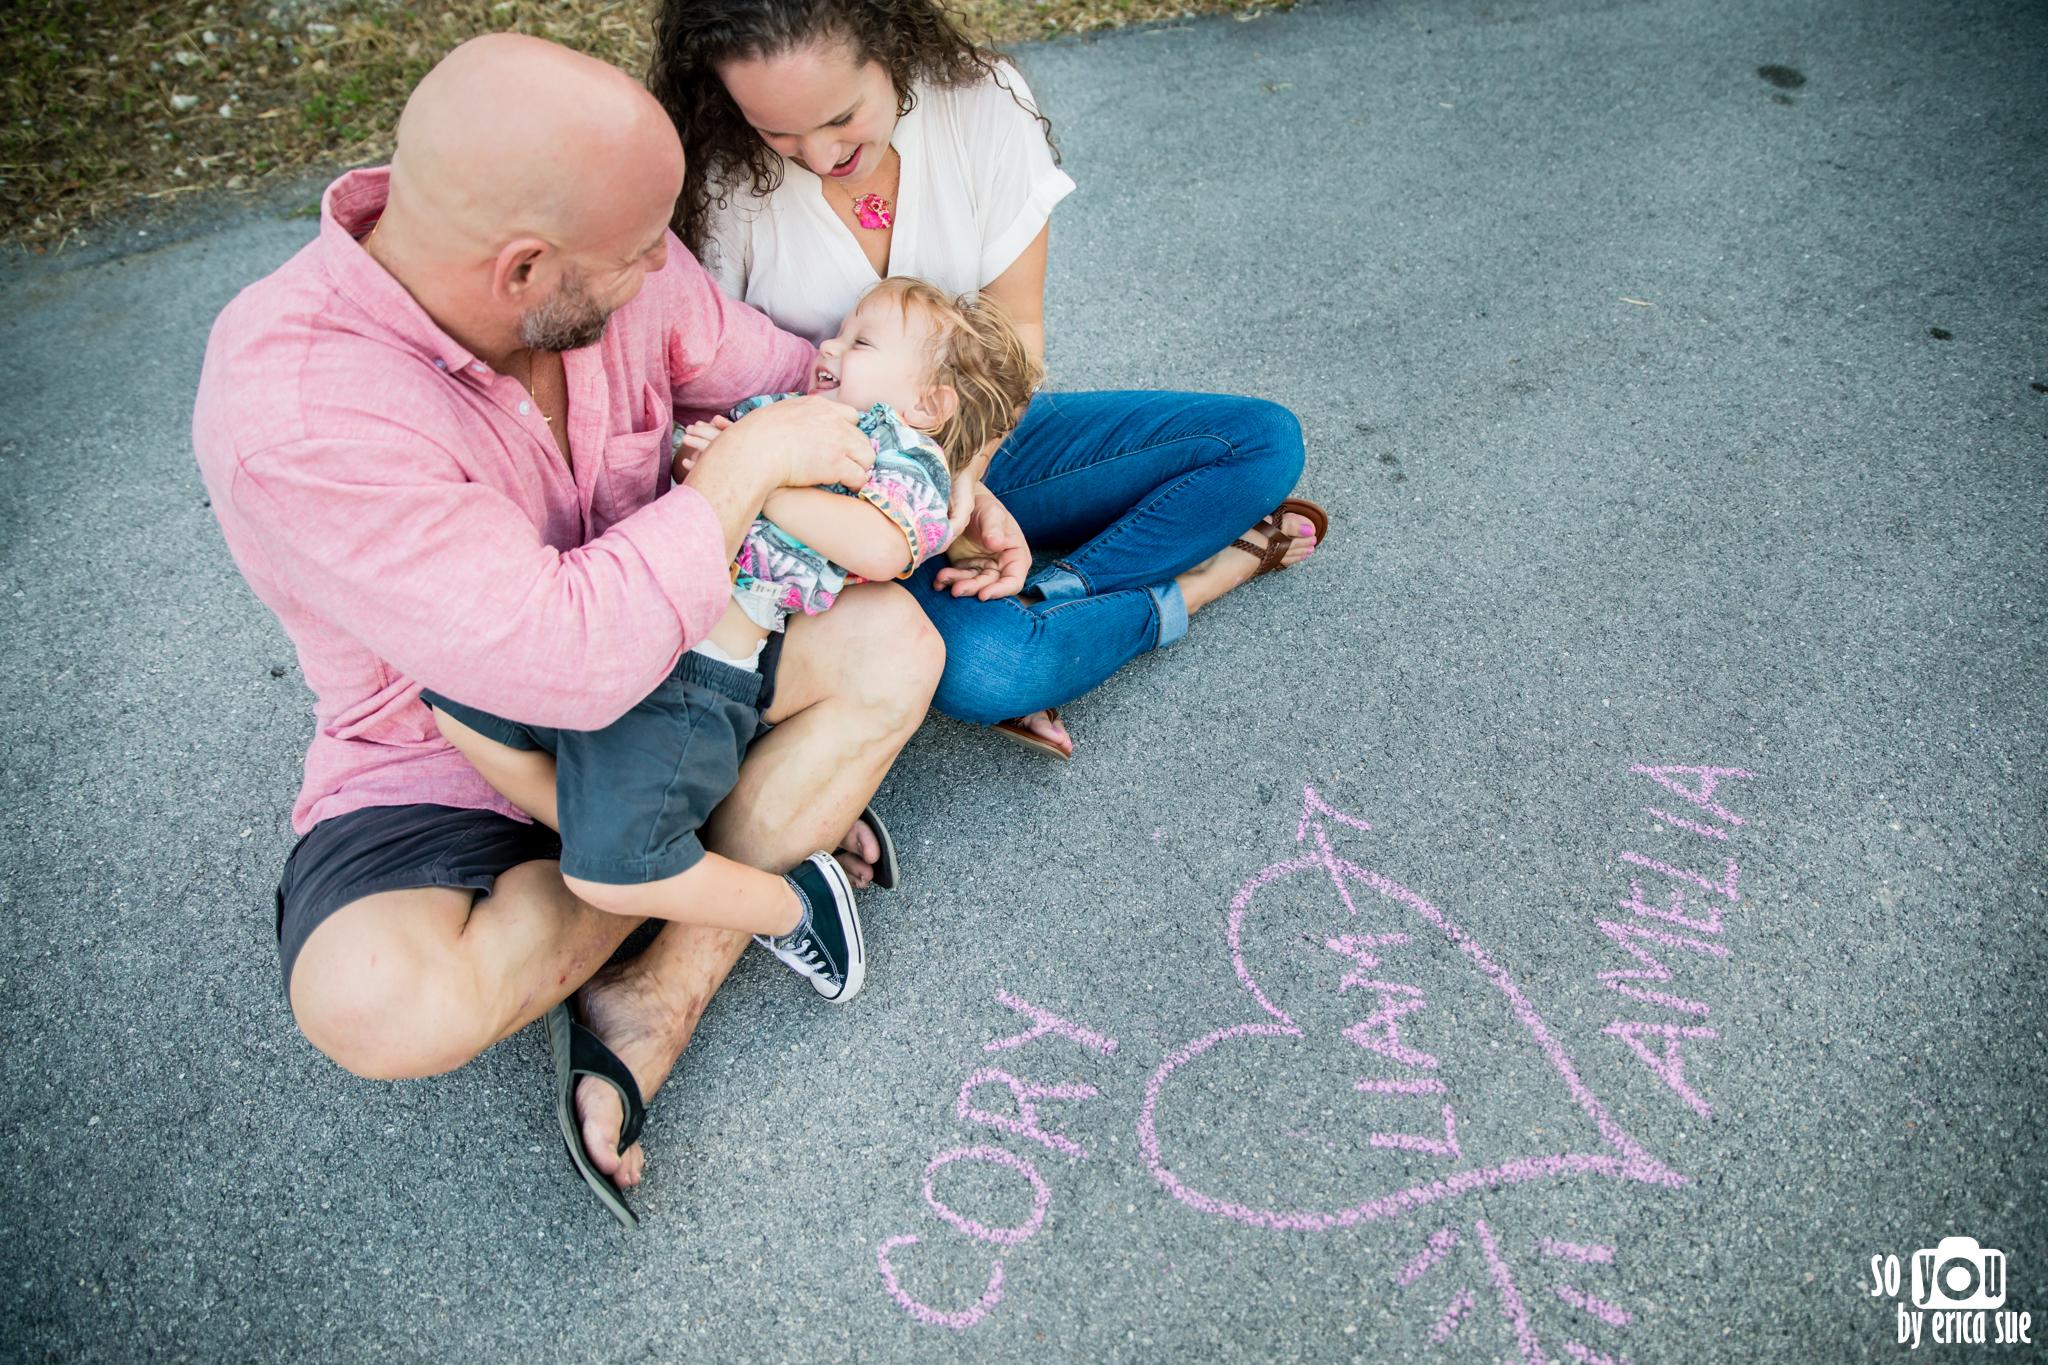 so-you-by-erica-wynwood-photo-shoot-family-photography-miami-7882.jpg